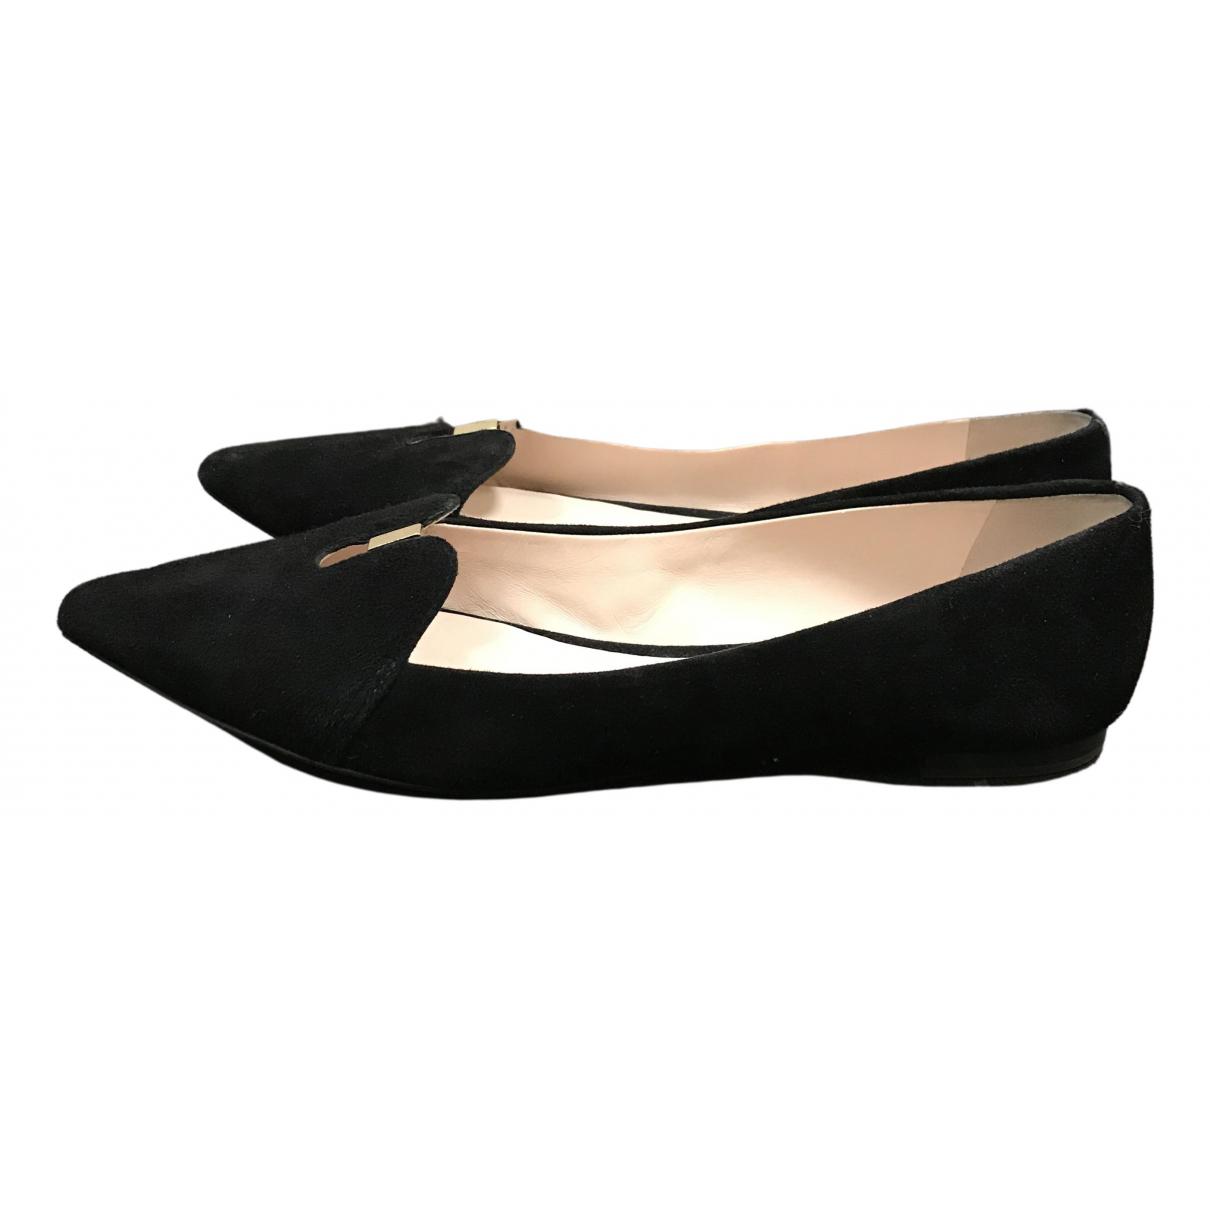 Aerin \N Black Suede Ballet flats for Women 10 US